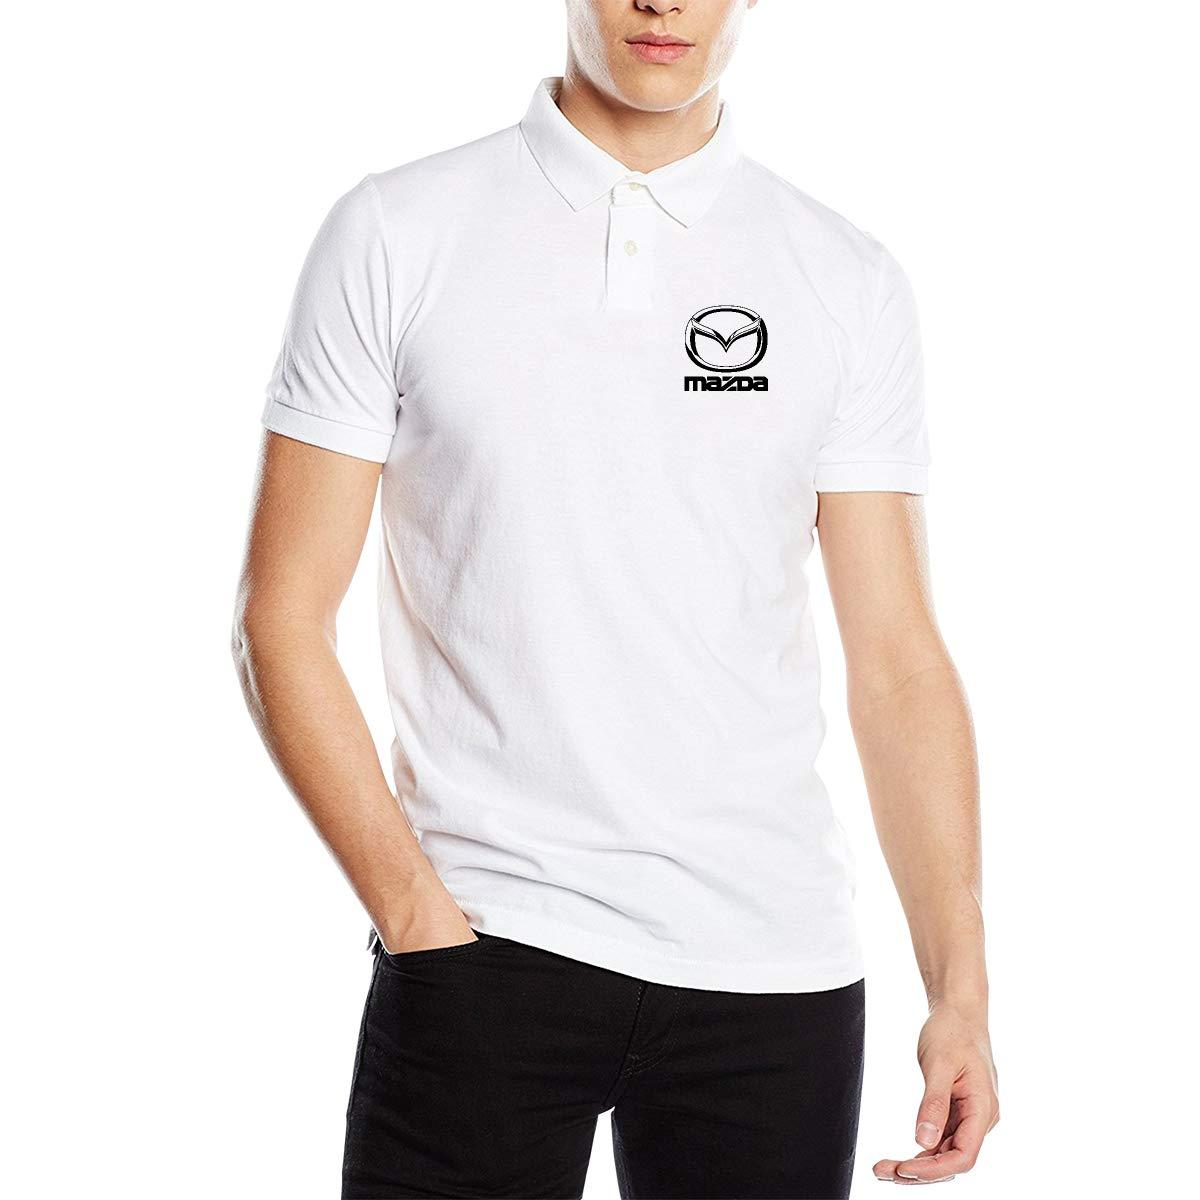 SHENGN Mens Custom Comfortable Mazda Logo Short Sleeve Fashion Polo T Shirt White